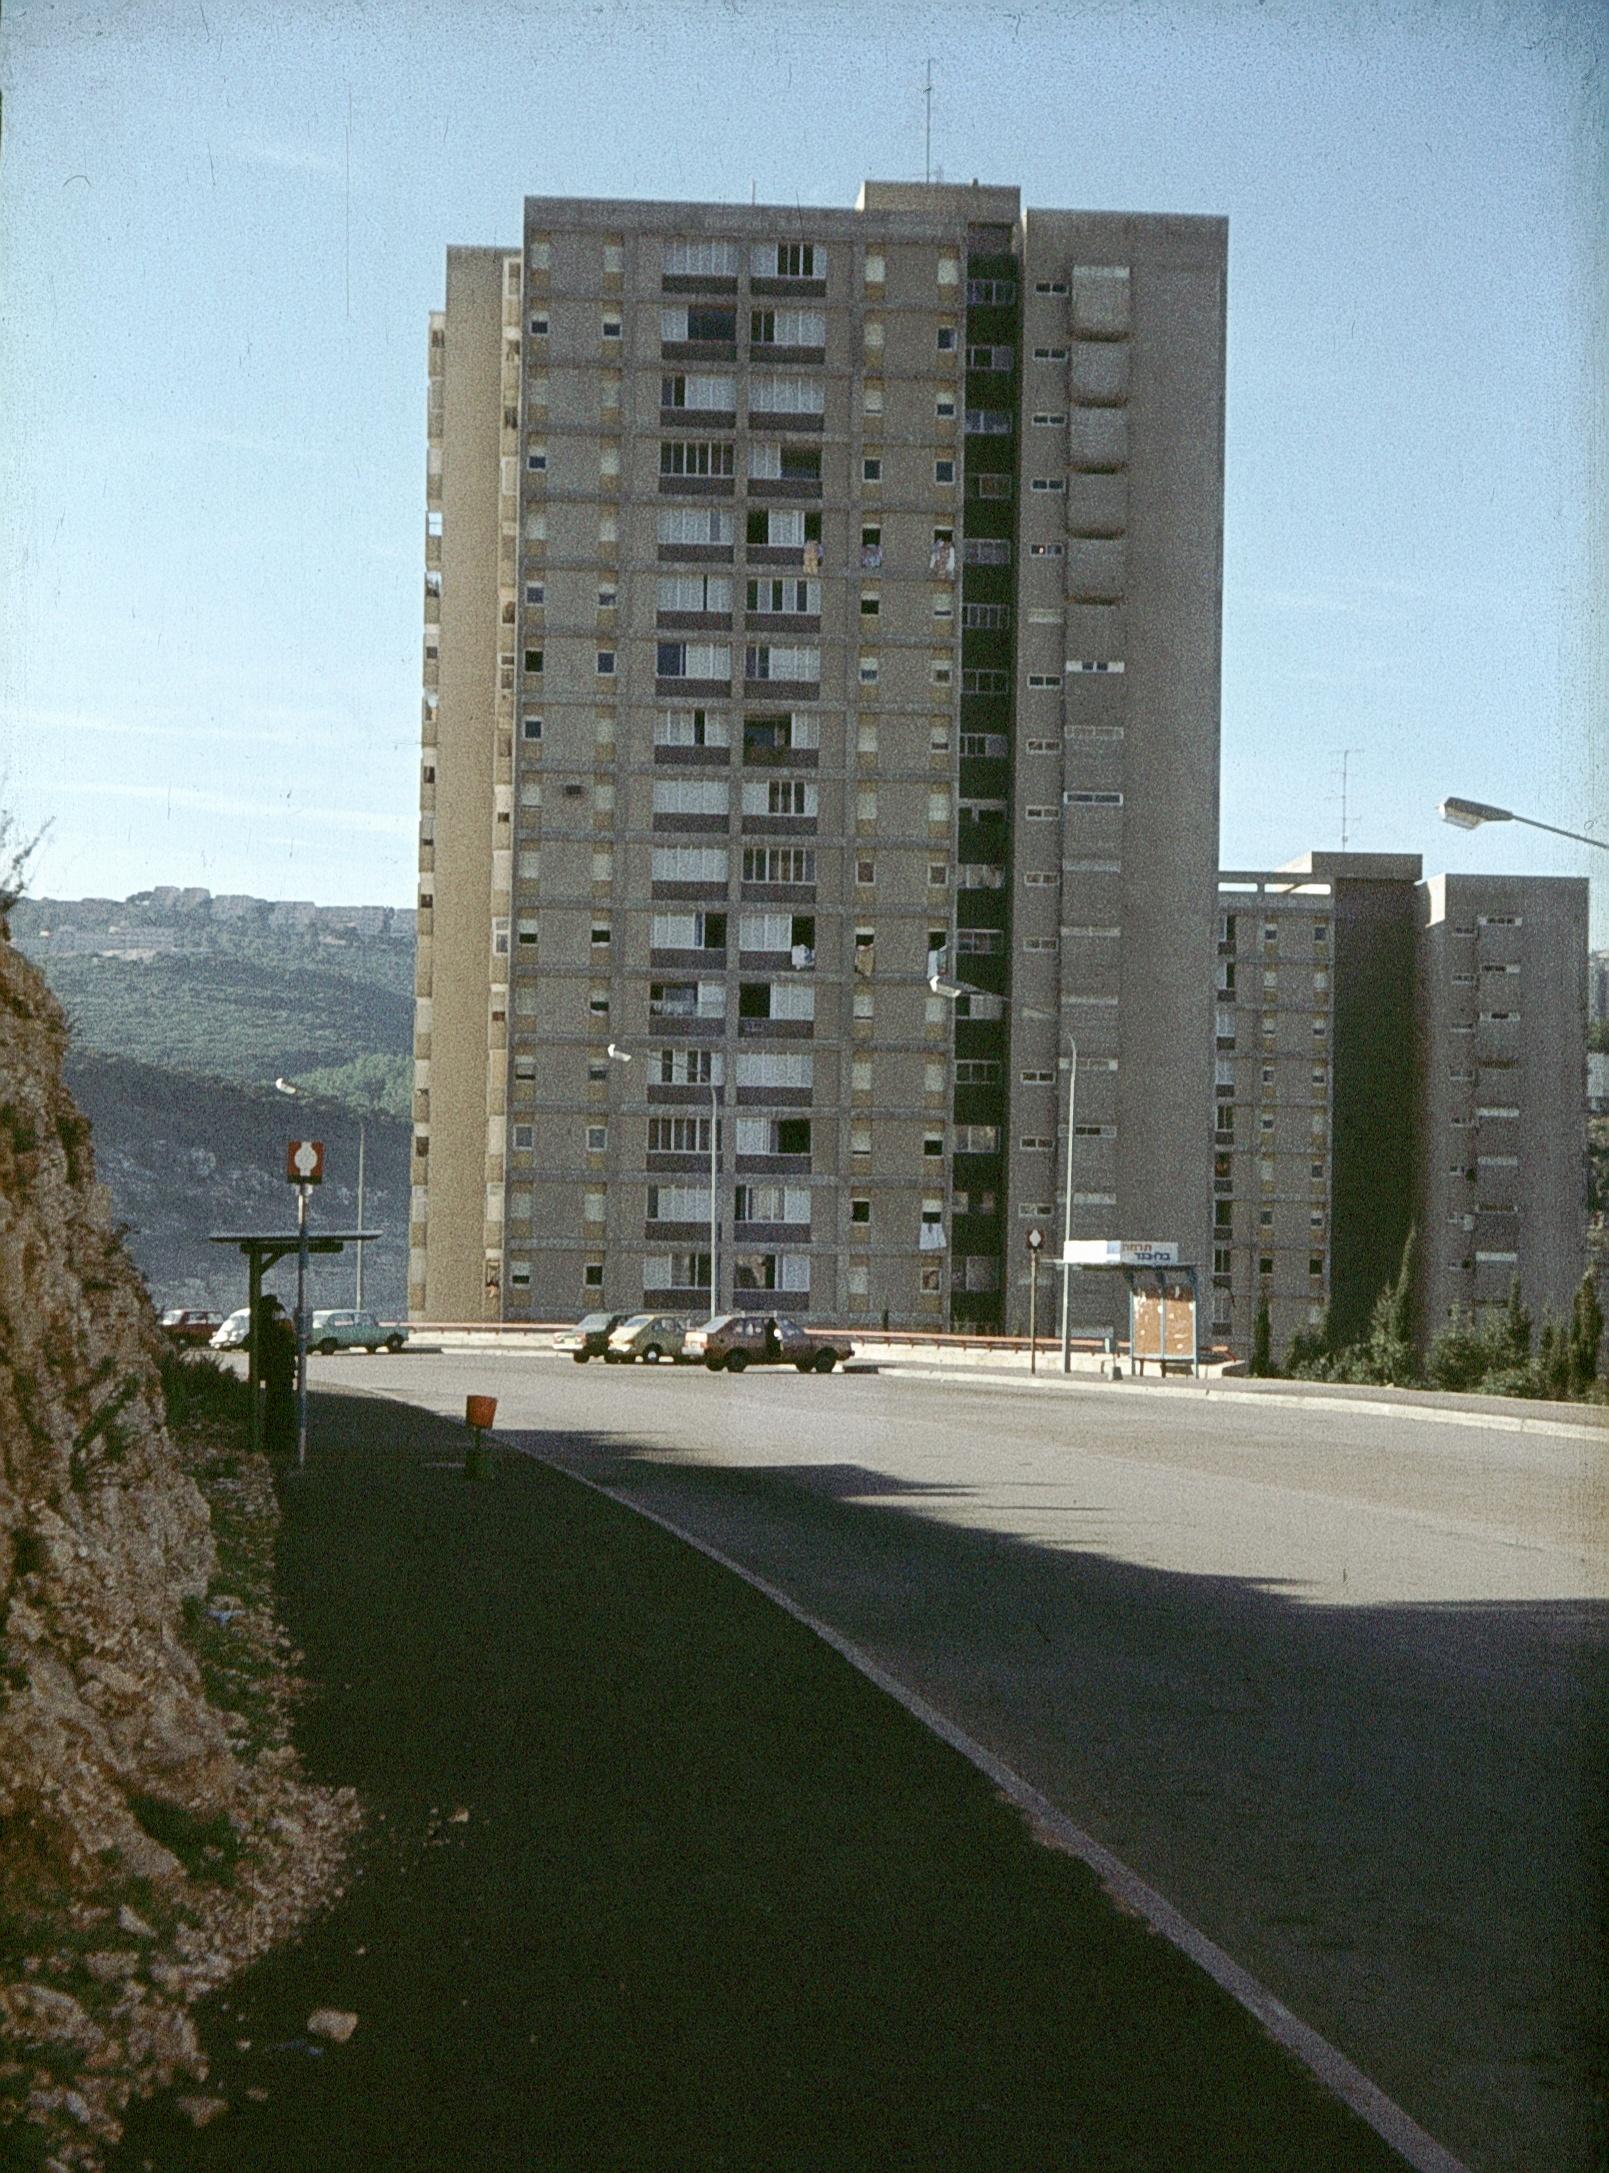 Улица Аба Гилель Сильвер. Неве Шеанан